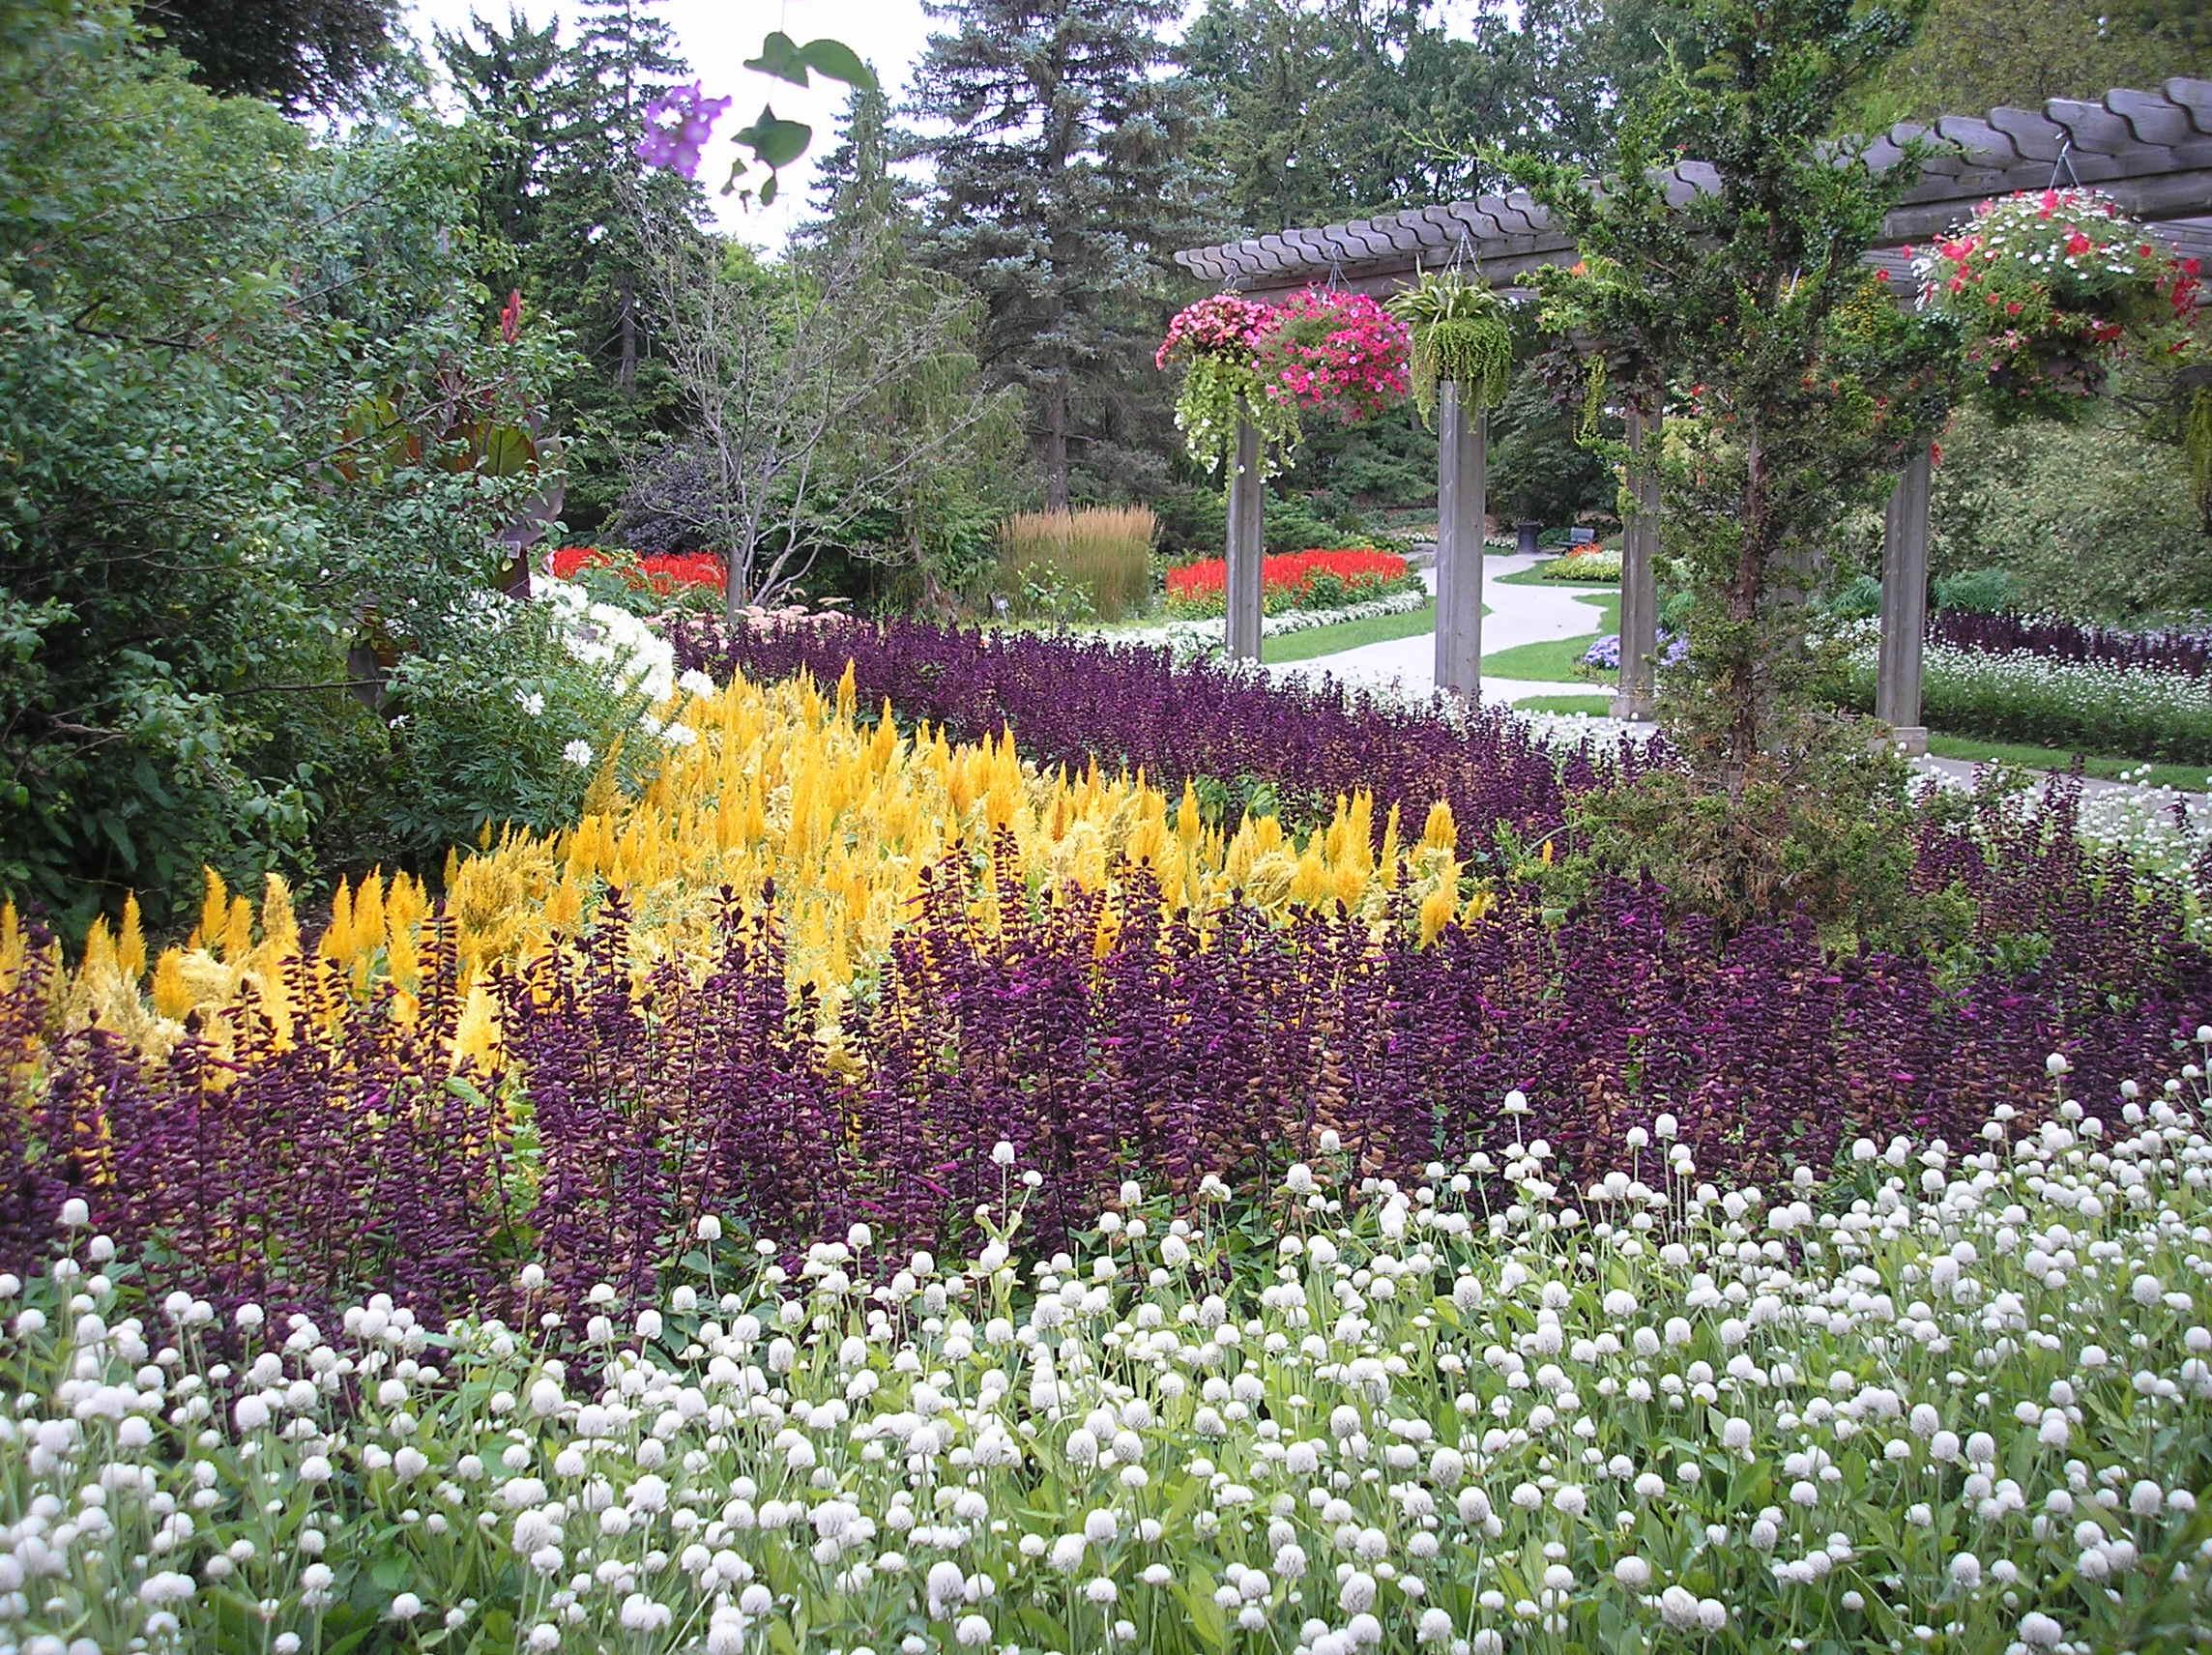 Germain Park Garden